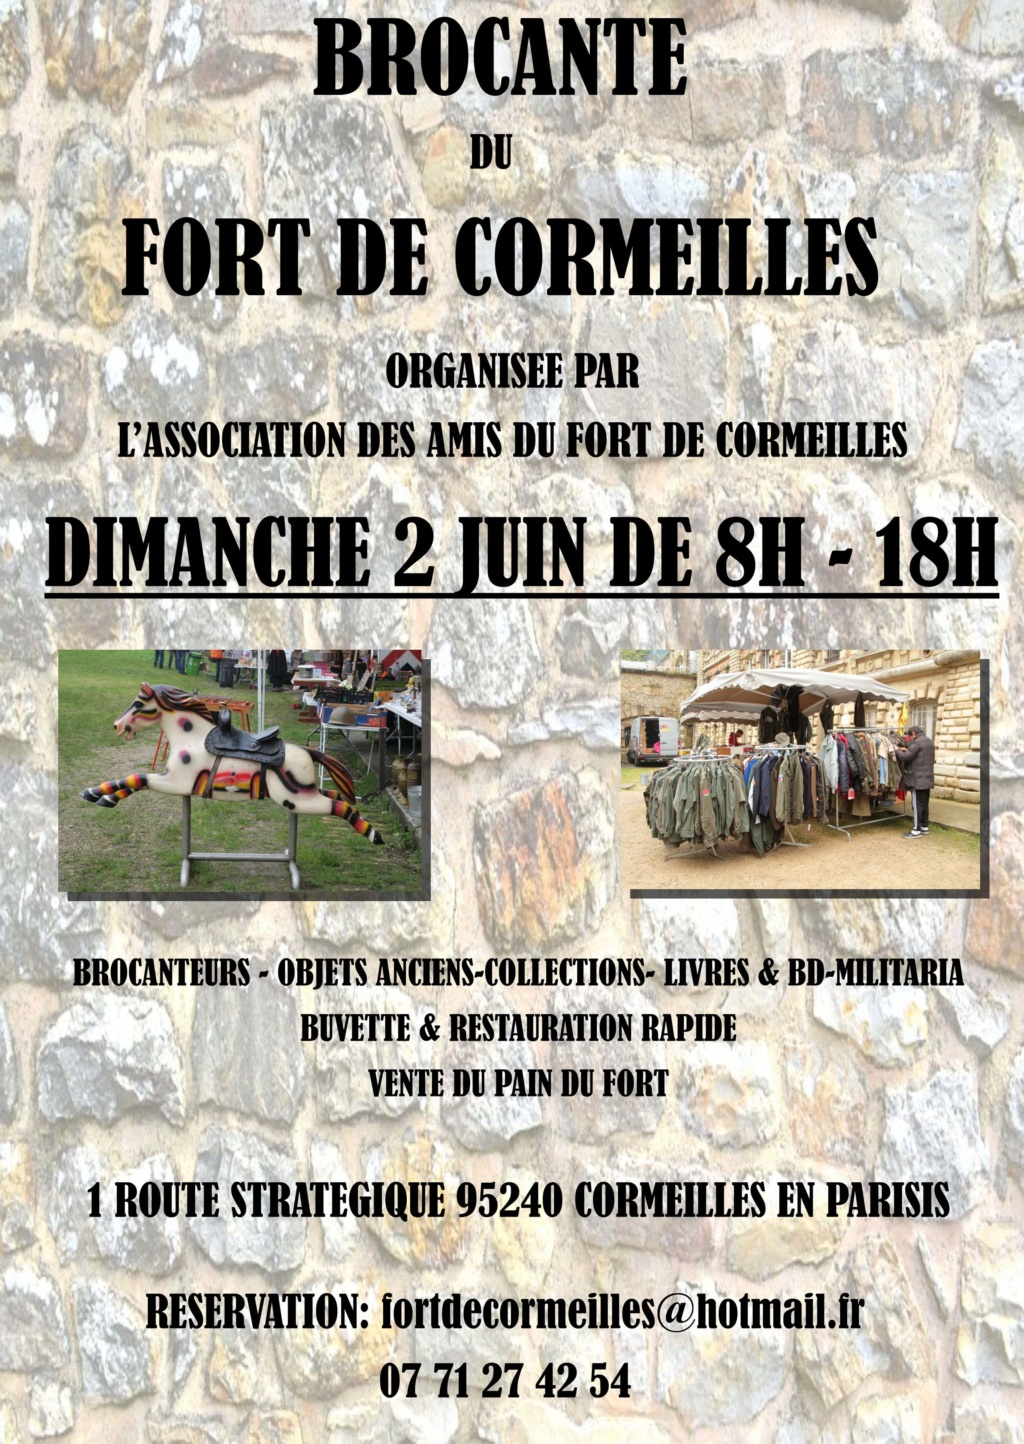 Brocante-bourse du fort de Cormeilles (95) – 2 Juin 2019 Brocan10